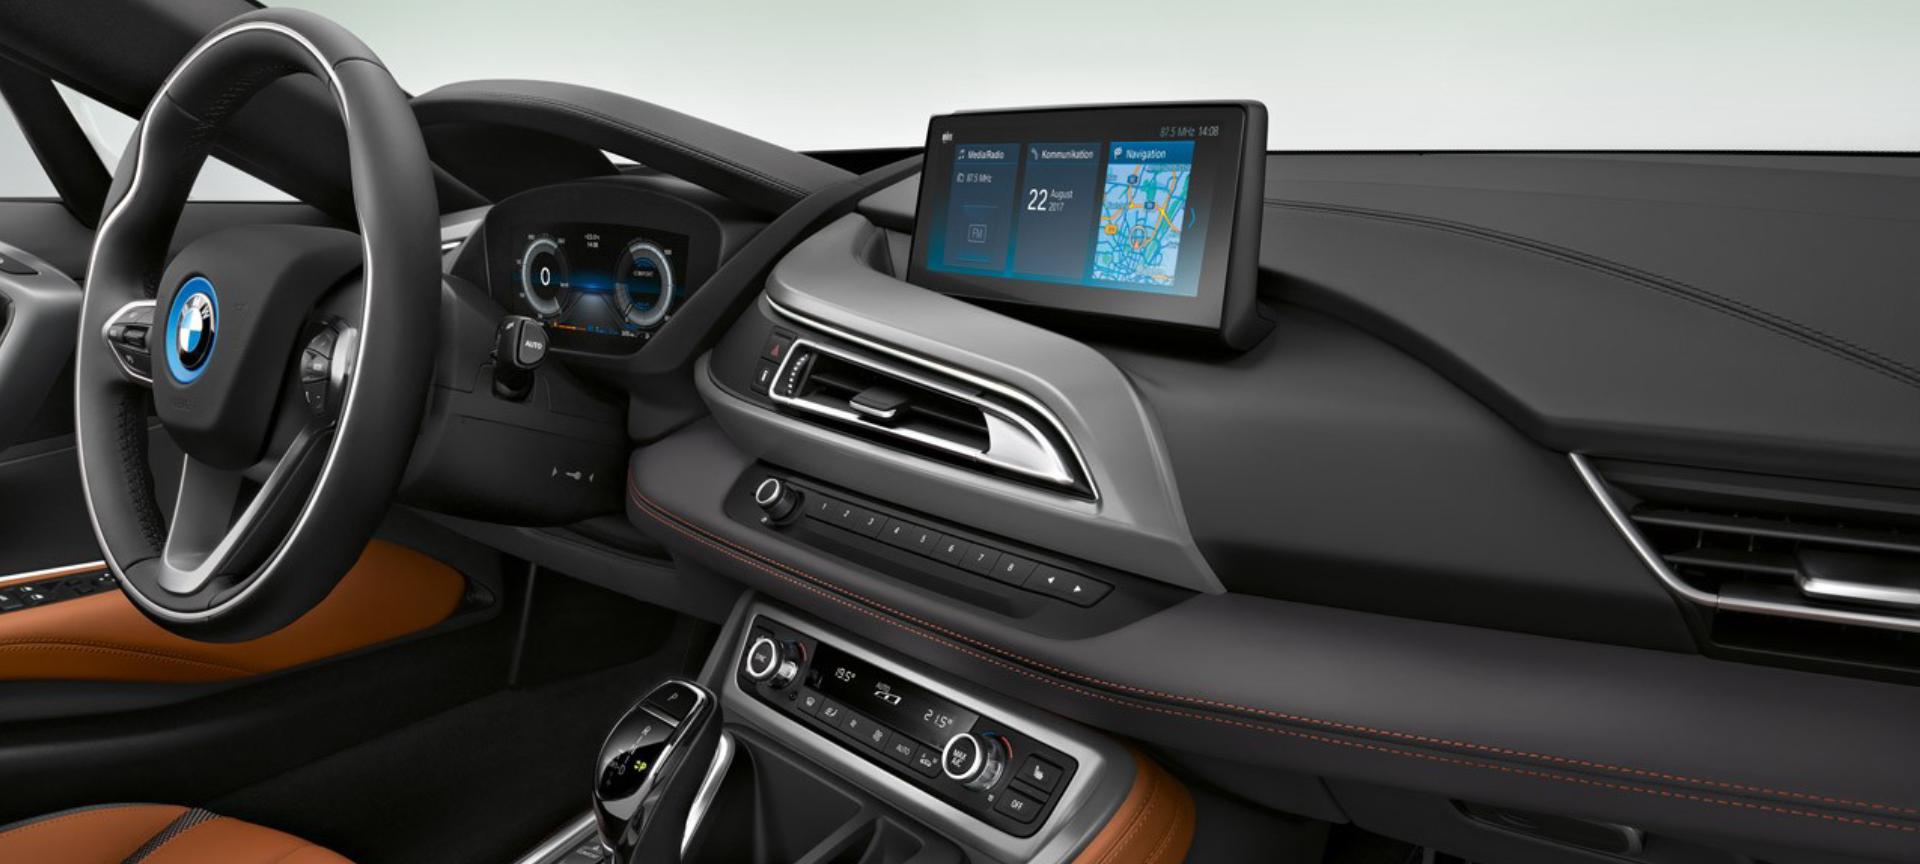 Bmw i8 coupe interior